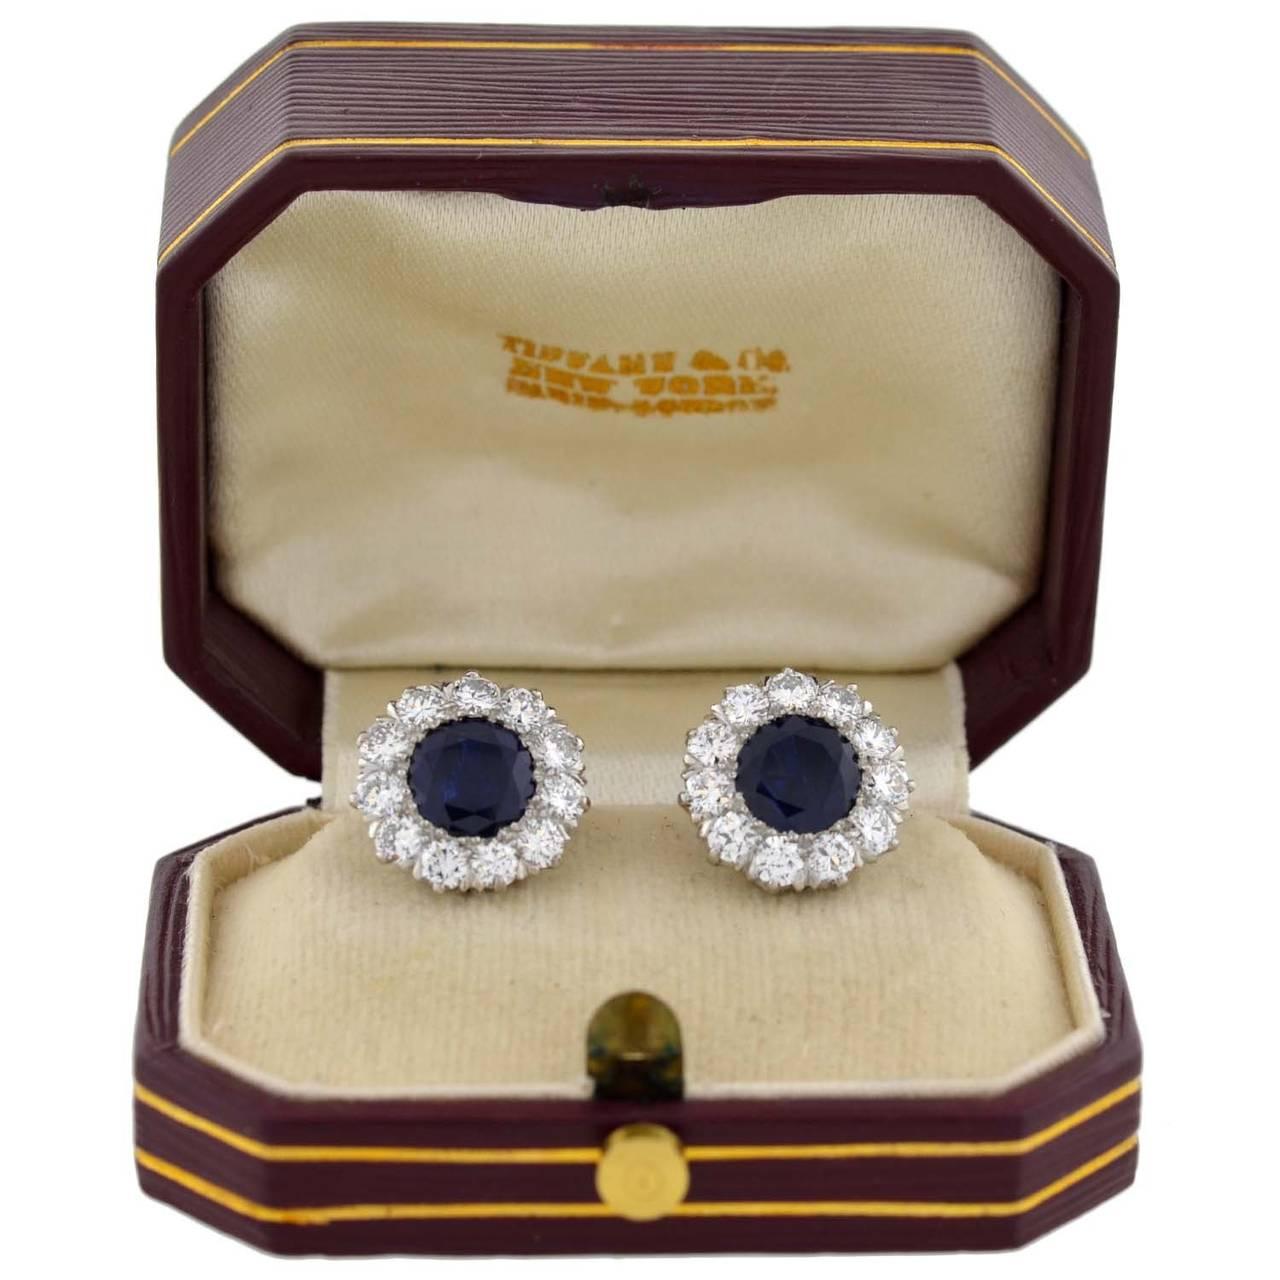 Tiffany & Co. Art Deco Burma Sapphire Diamond Platinum Earrings 8